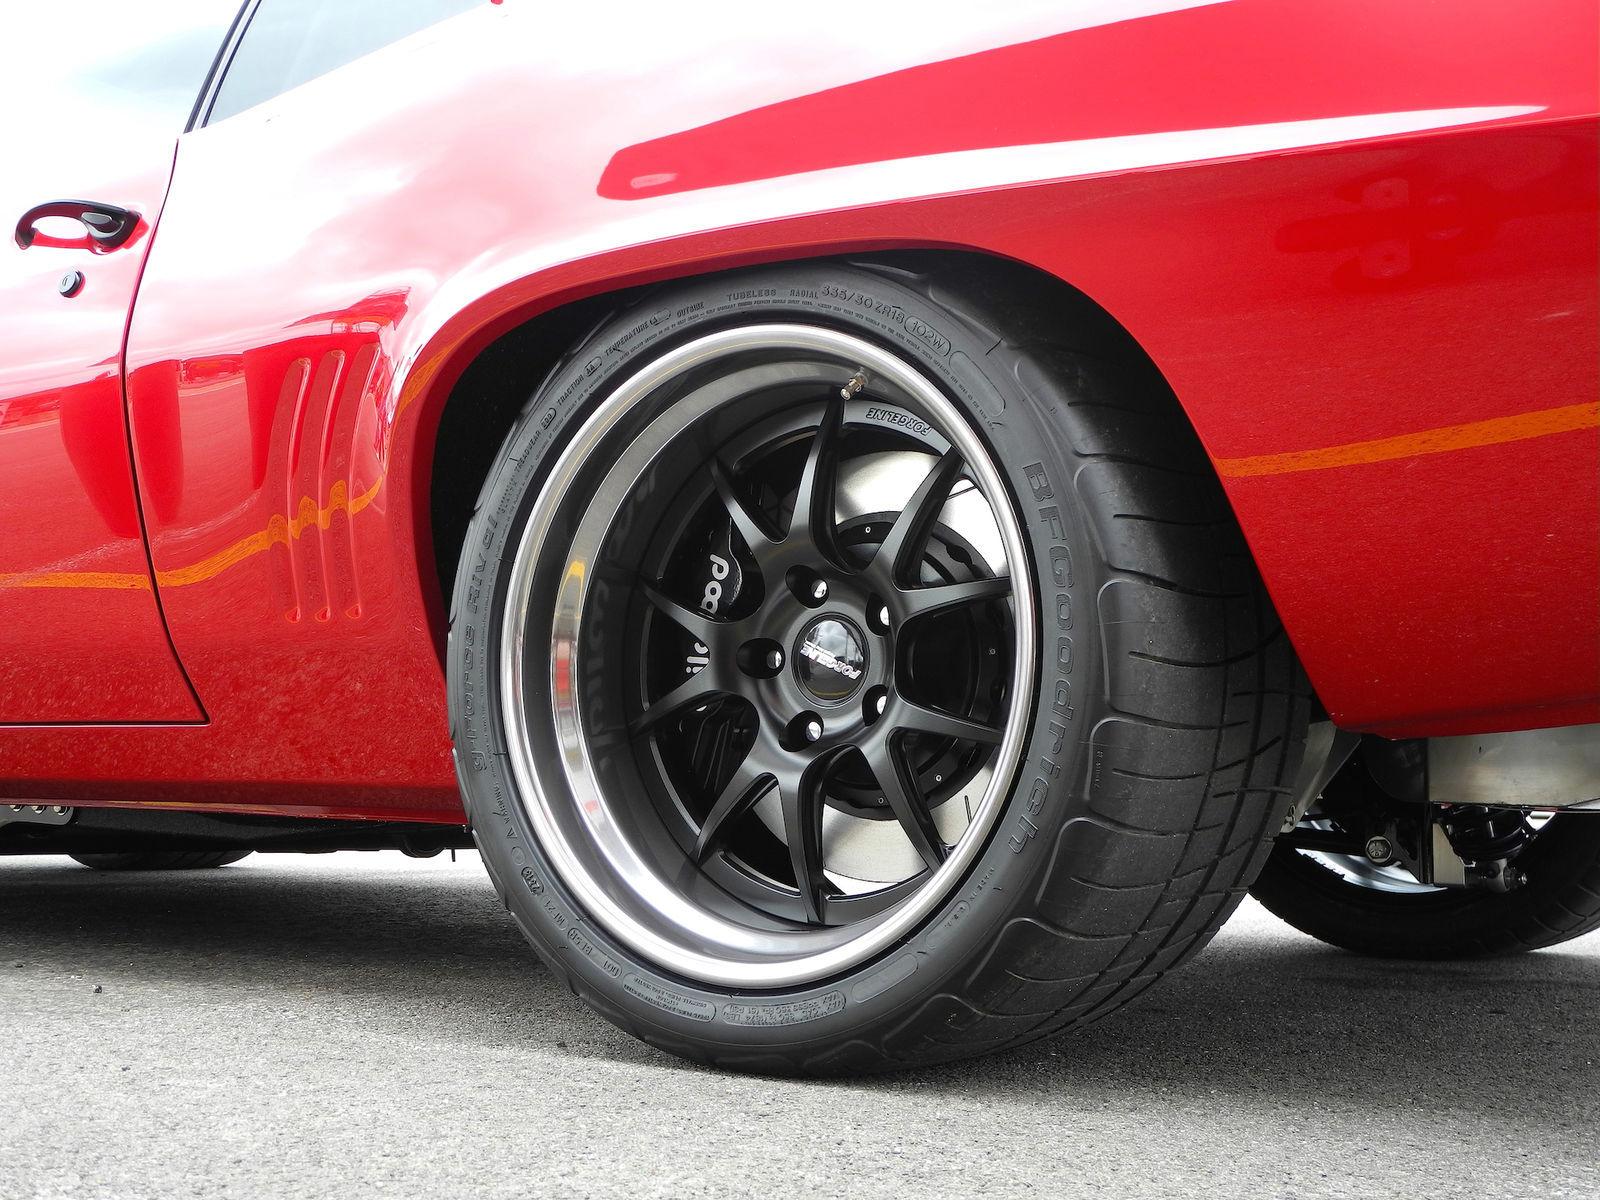 1969 Chevrolet Camaro | Randy Maynard's '69 Camaro on Forgeline GA3 Wheels at Goodguys Columbus